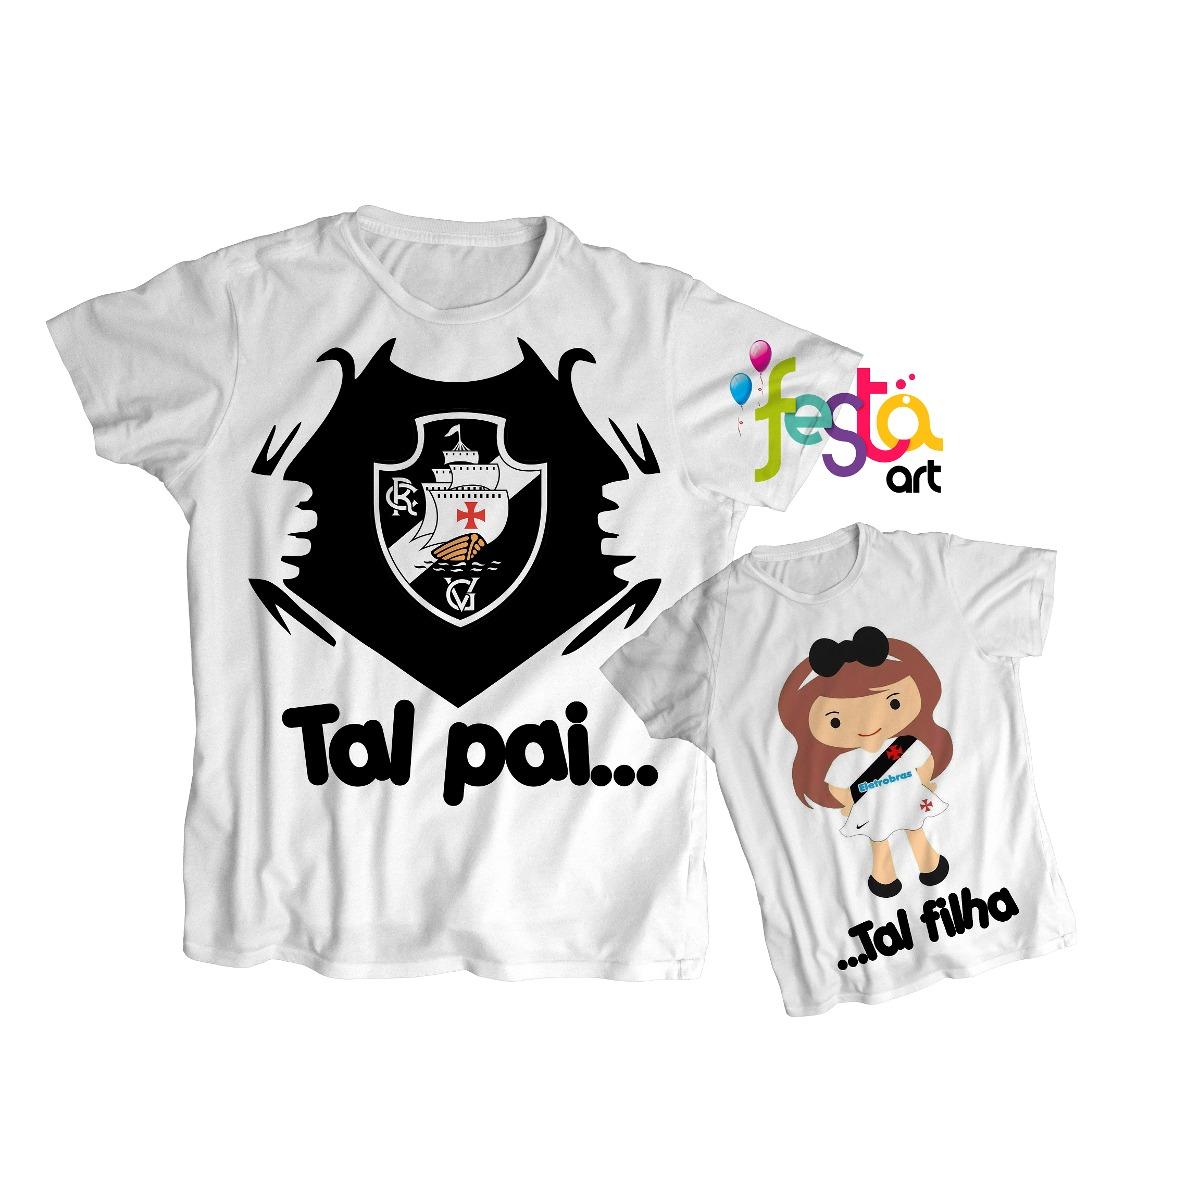 a48cff2690 Kit Tal Pai Tal Filho Palmeiras Qualquer Time 2 Camisetas - R  59